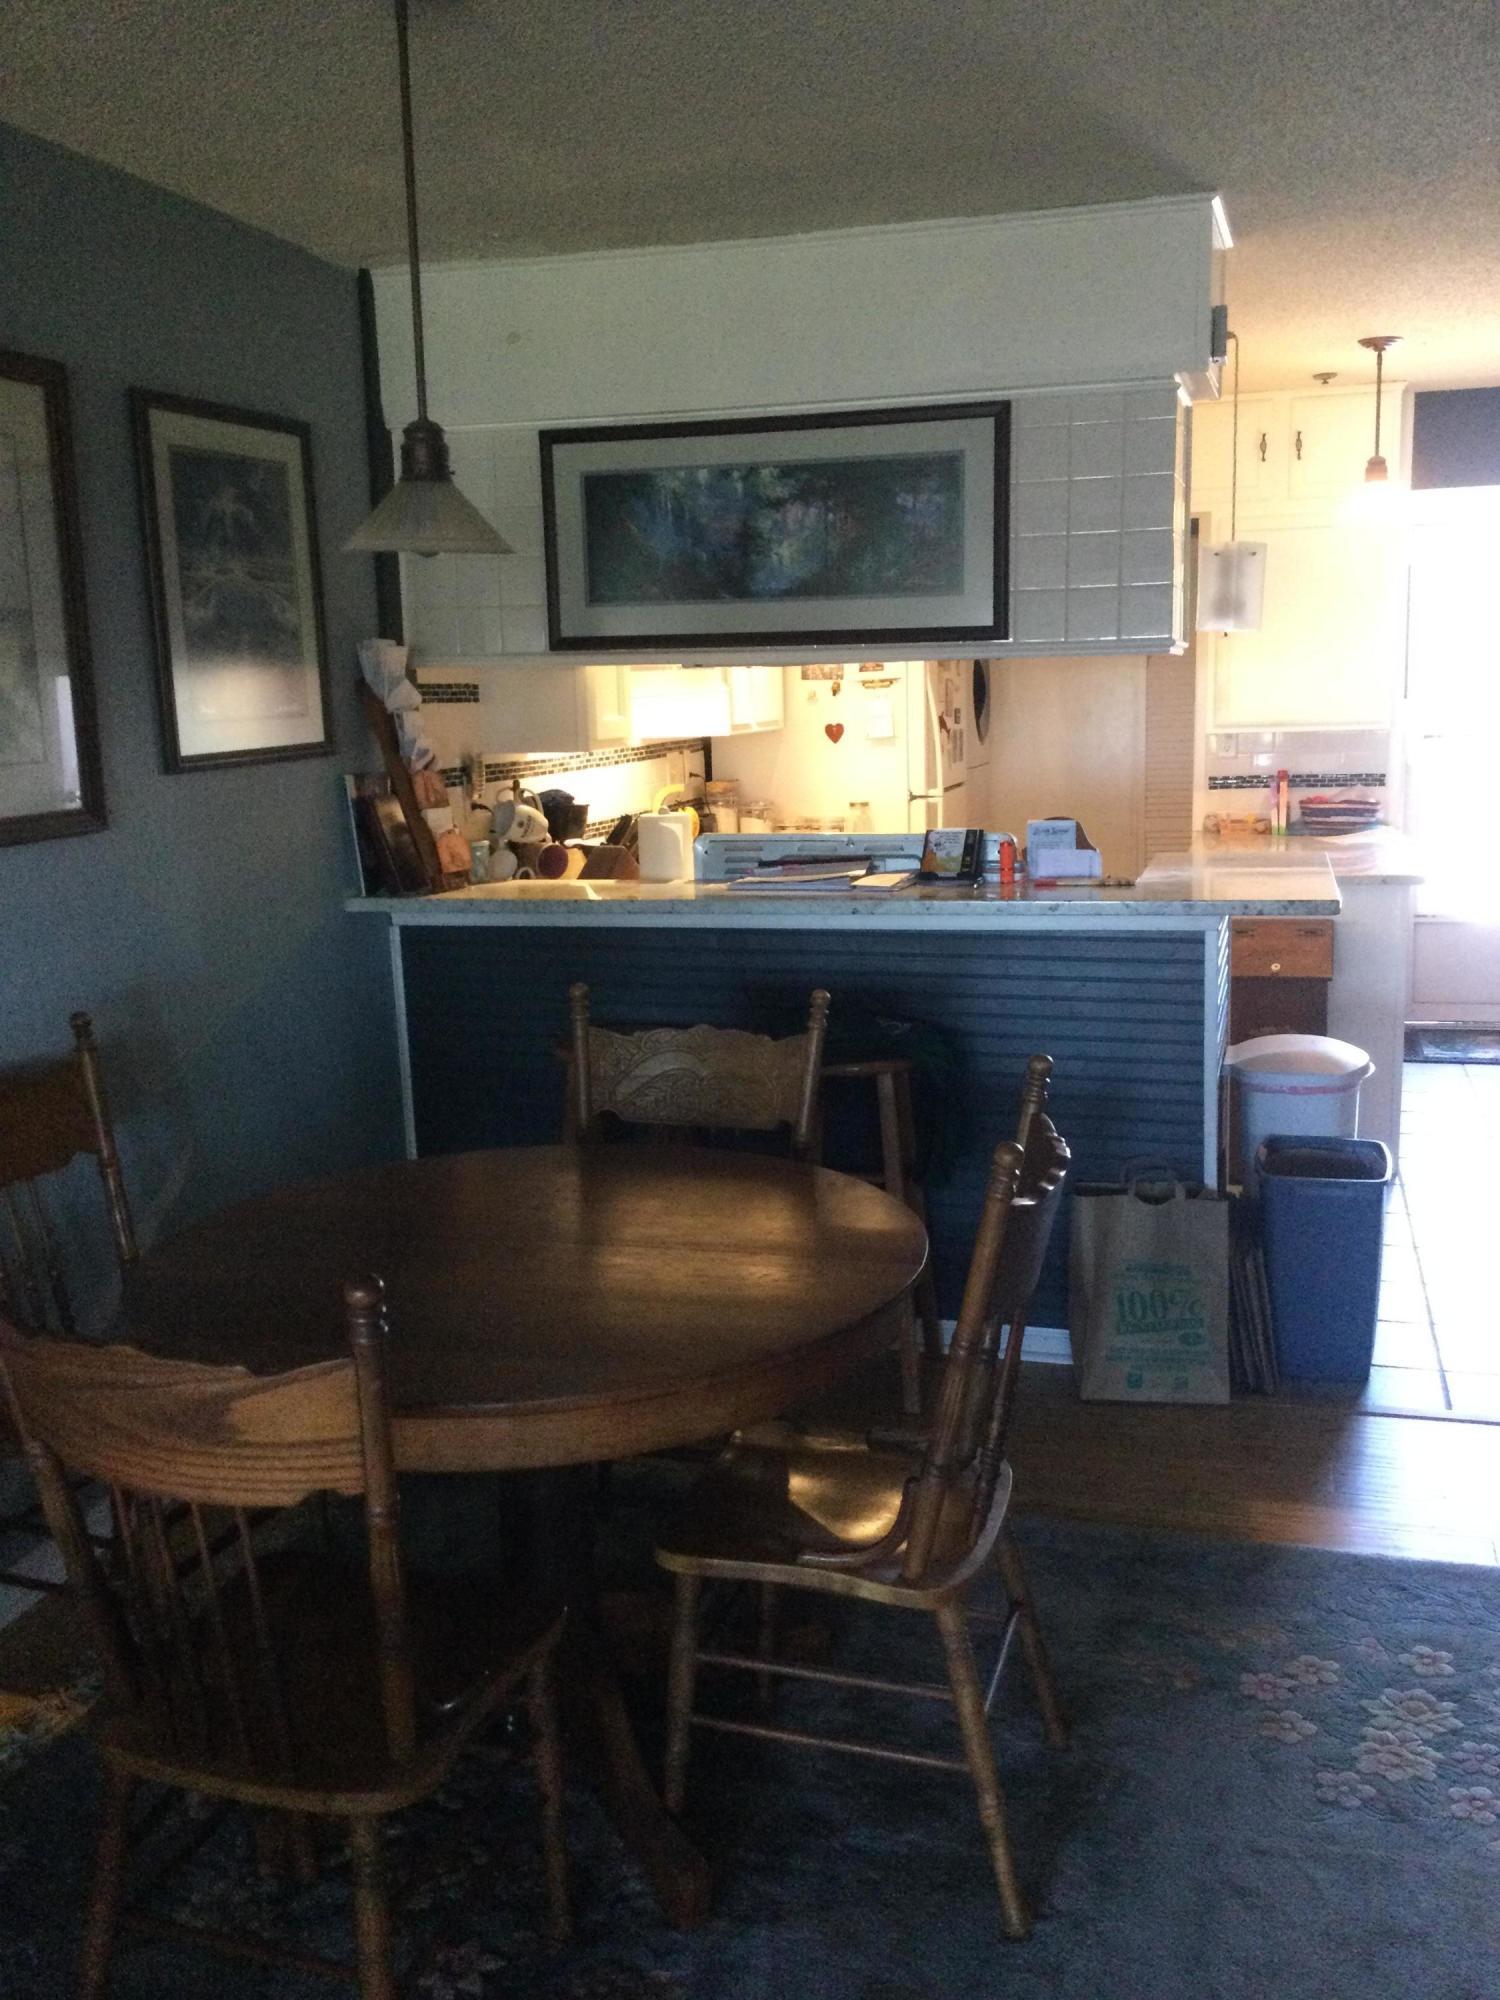 Marshview Villas Homes For Sale - 124 Mariners Cay, Folly Beach, SC - 14